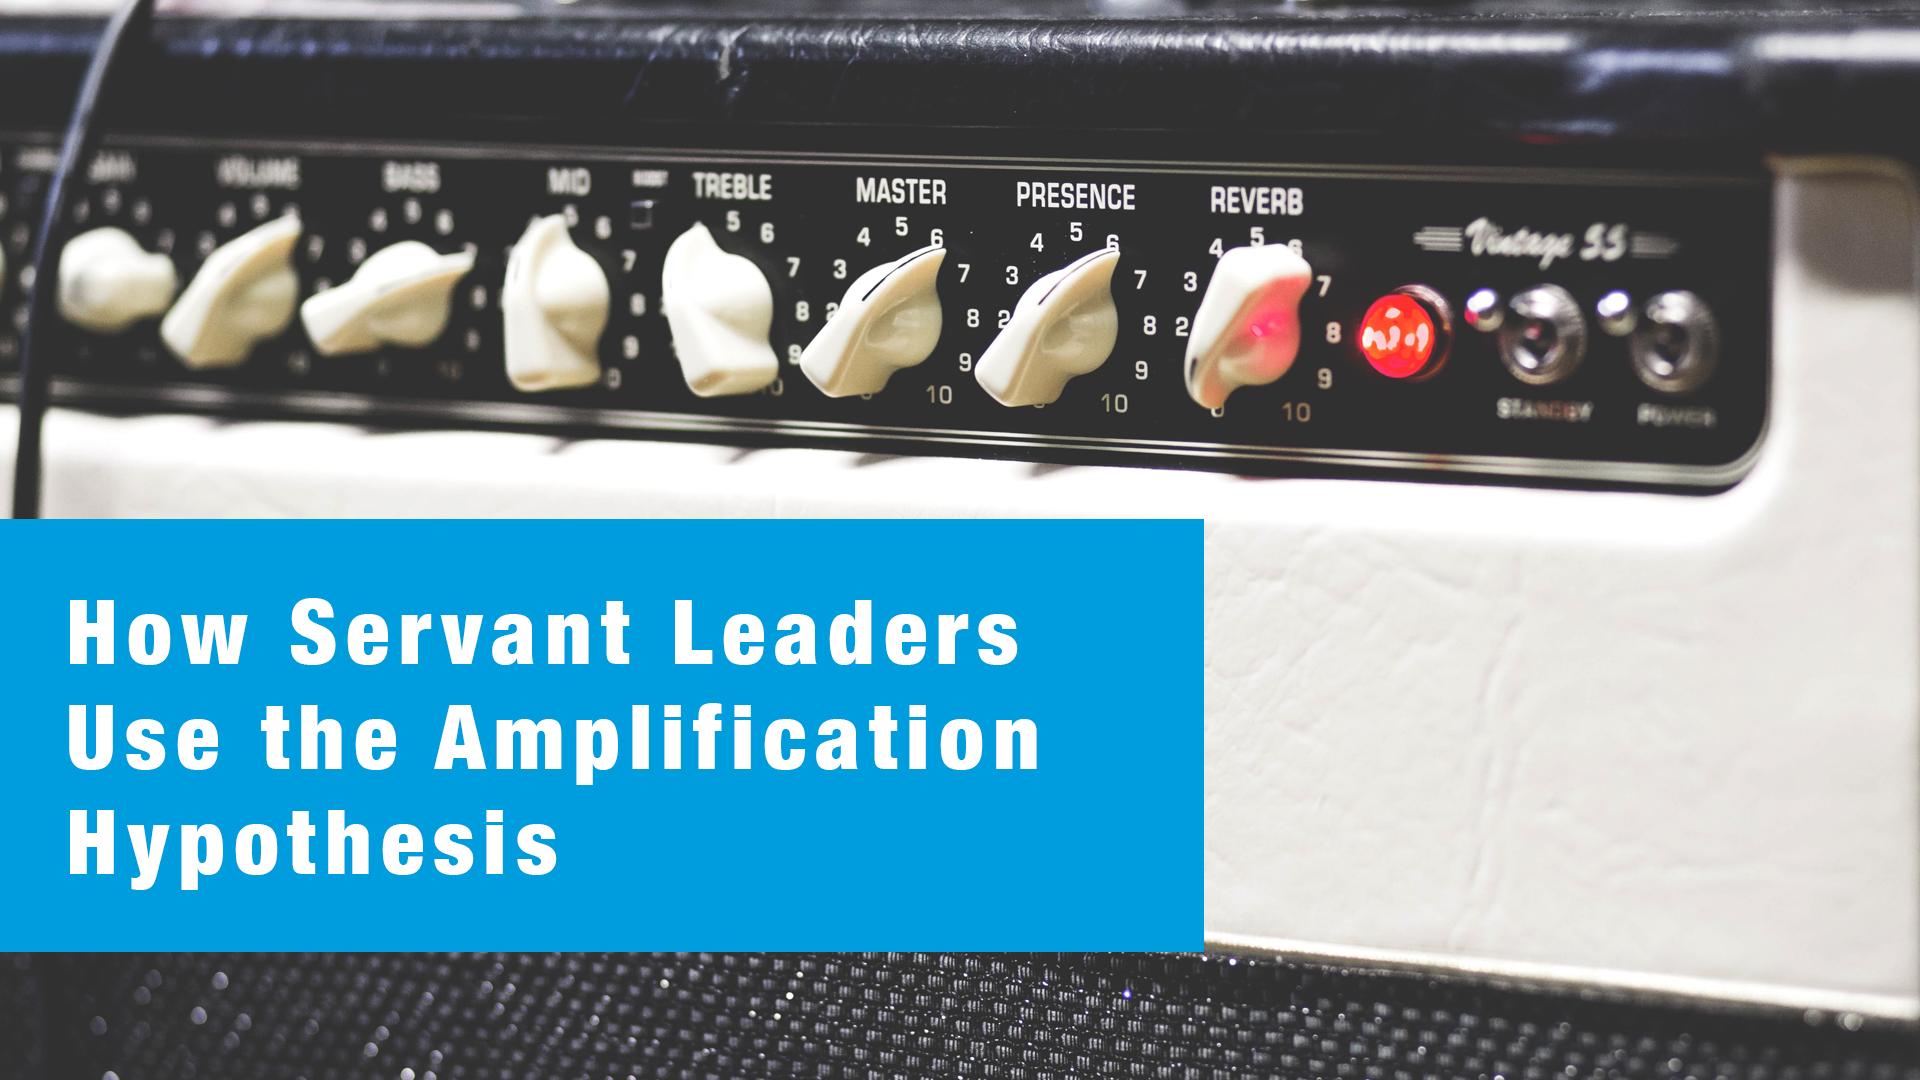 Amplification Hypothesis 1920x1080 .jpg